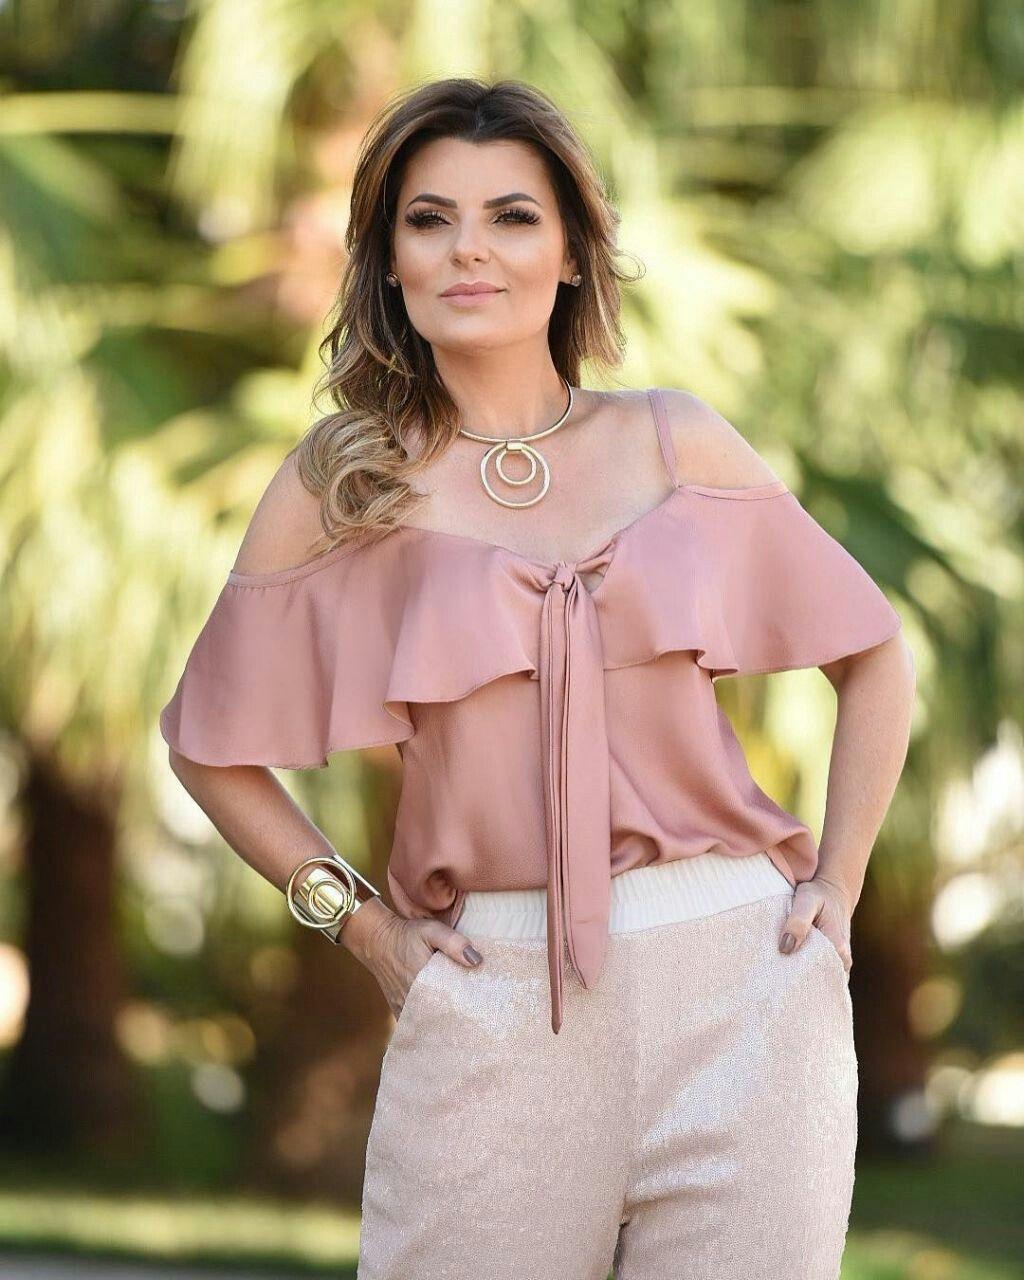 Pin de Edder Pareja en Dresses | Pinterest | Ropa bonita, Blusas y ...